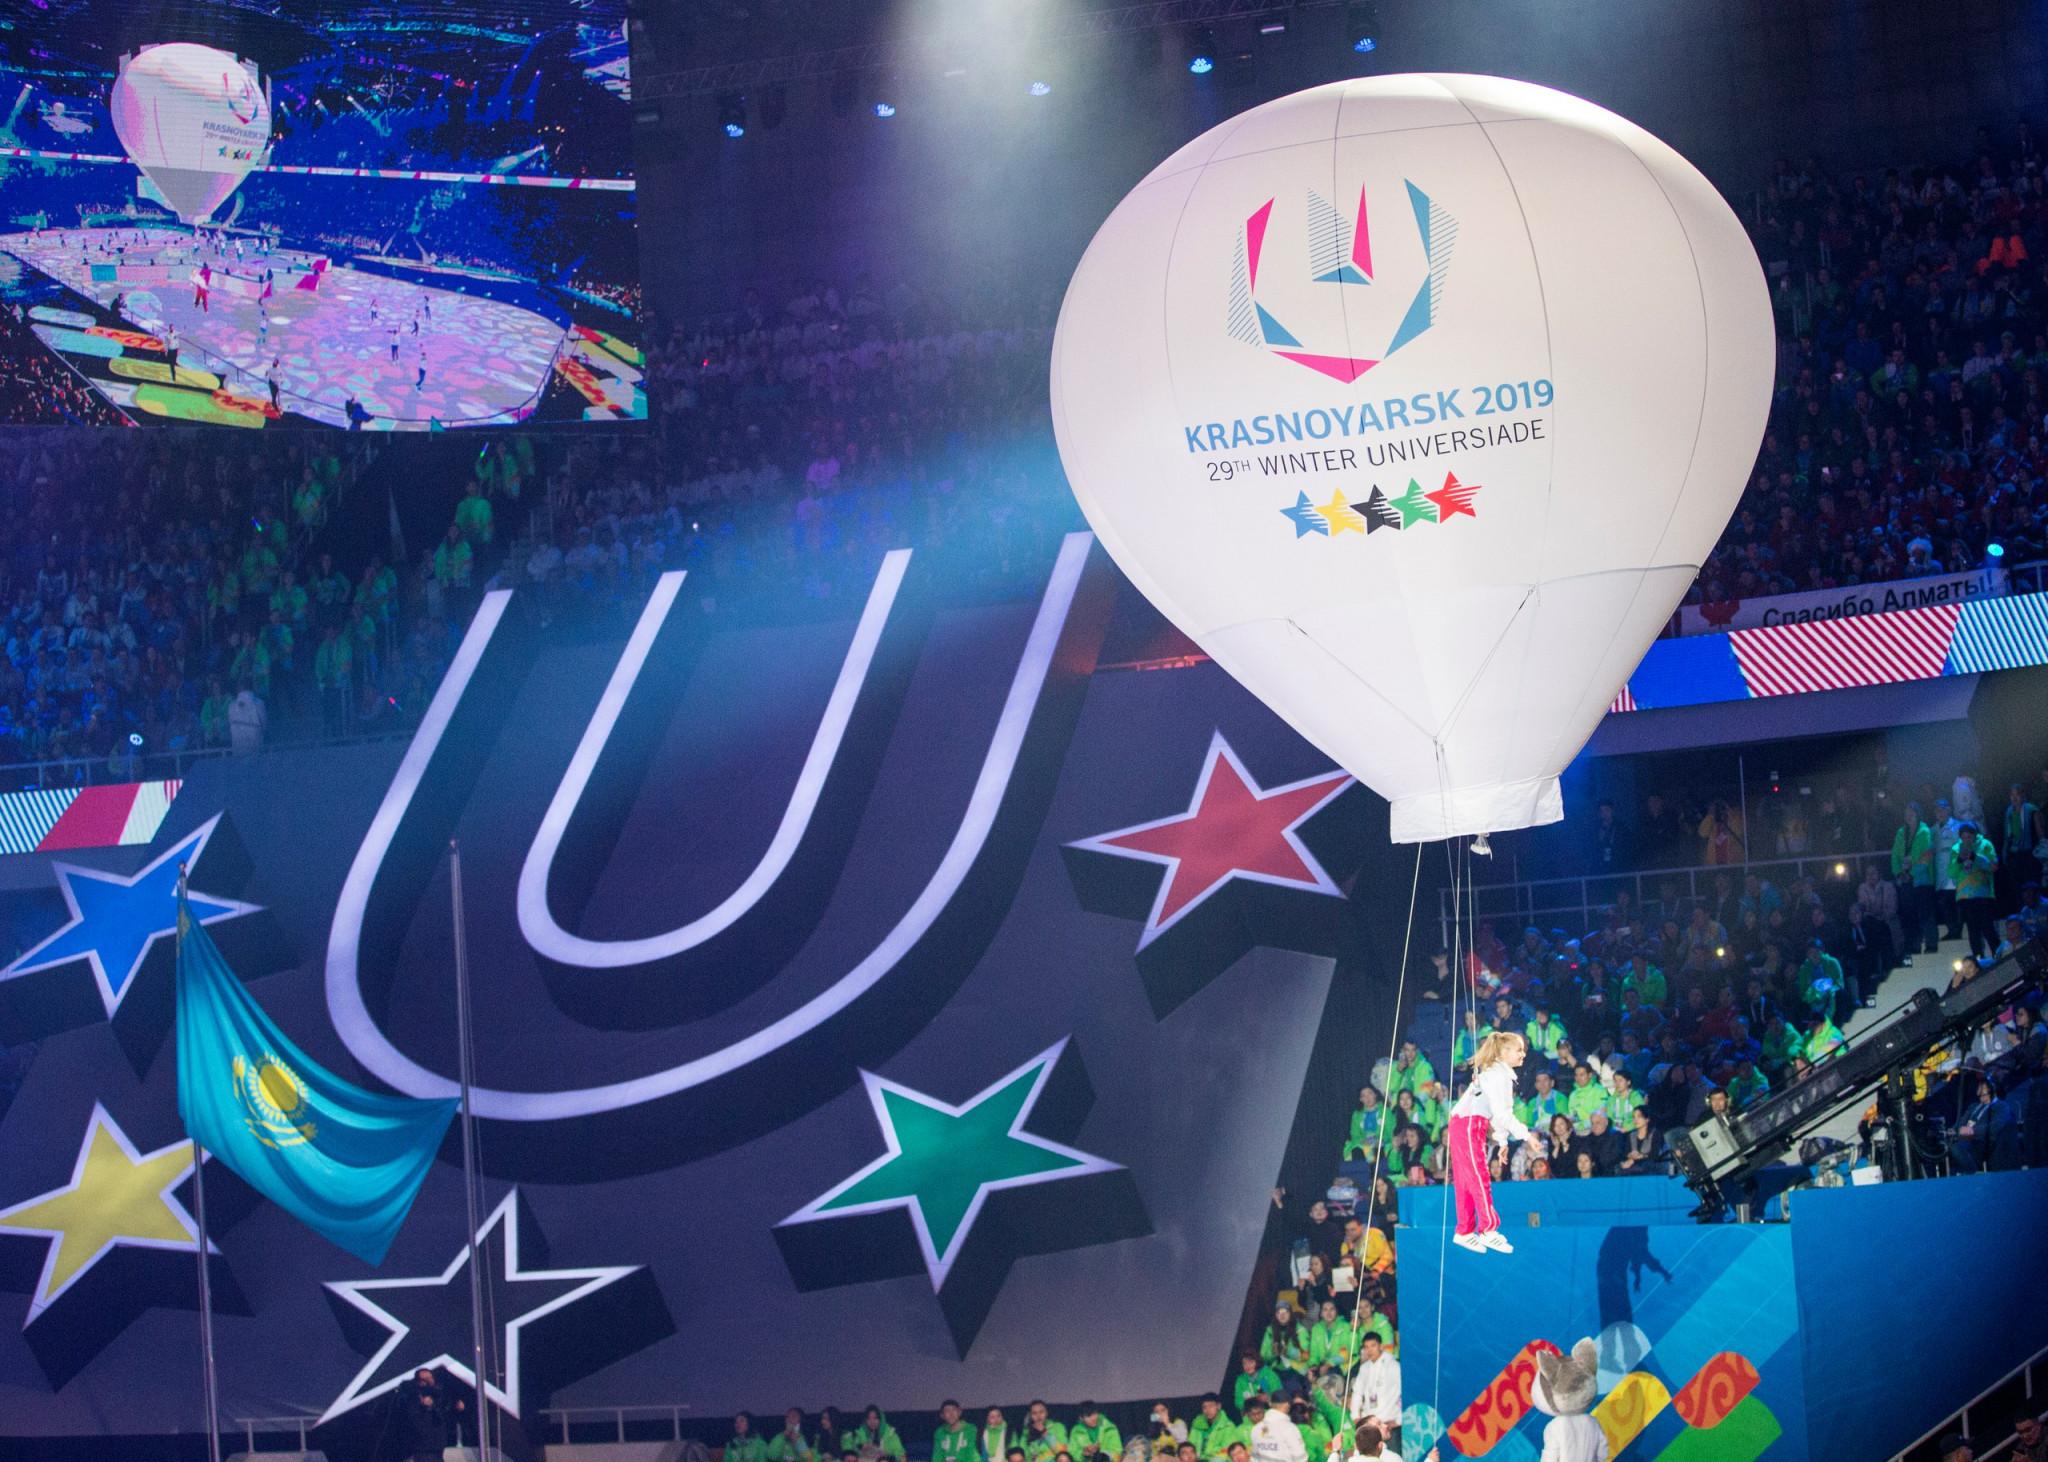 The Russian city of Krasnoyarsk was awarded the 2019 Winter Universiade in November 2013 ©Krasnoyarsk 2019